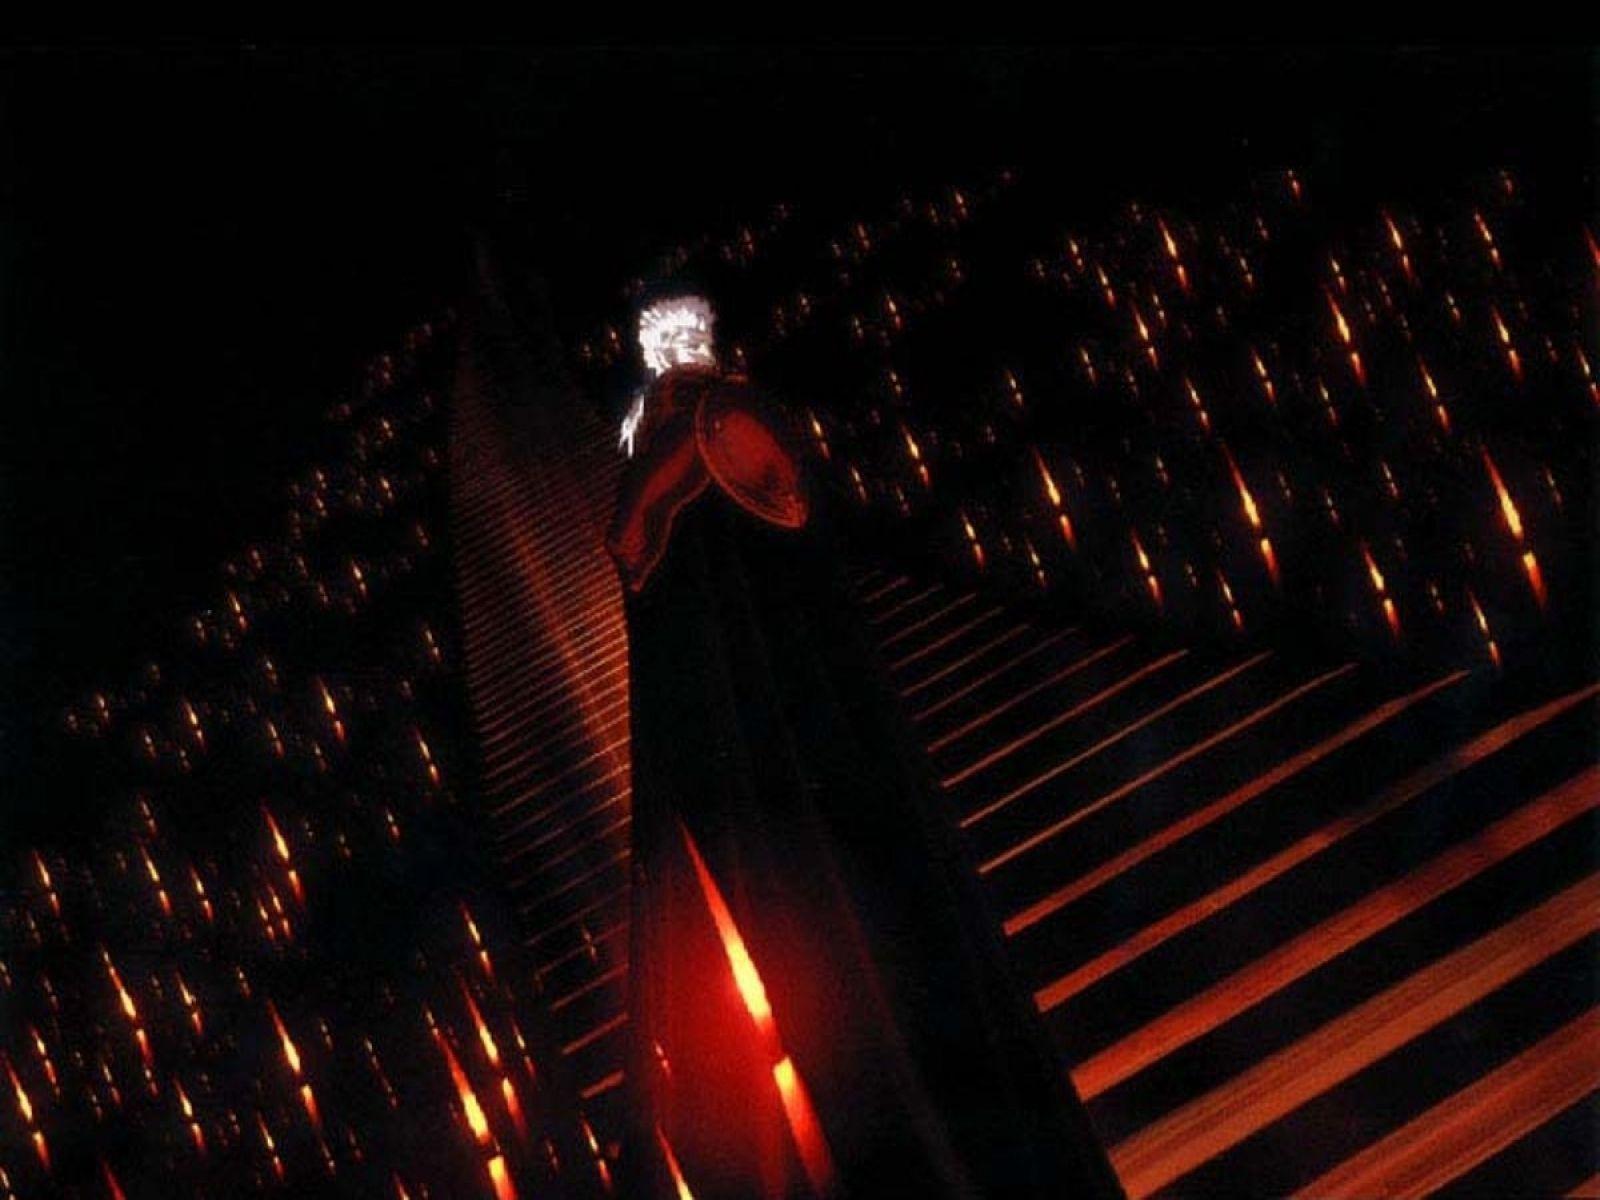 Anime Vampire Wallpapers - Wallpaper Cave